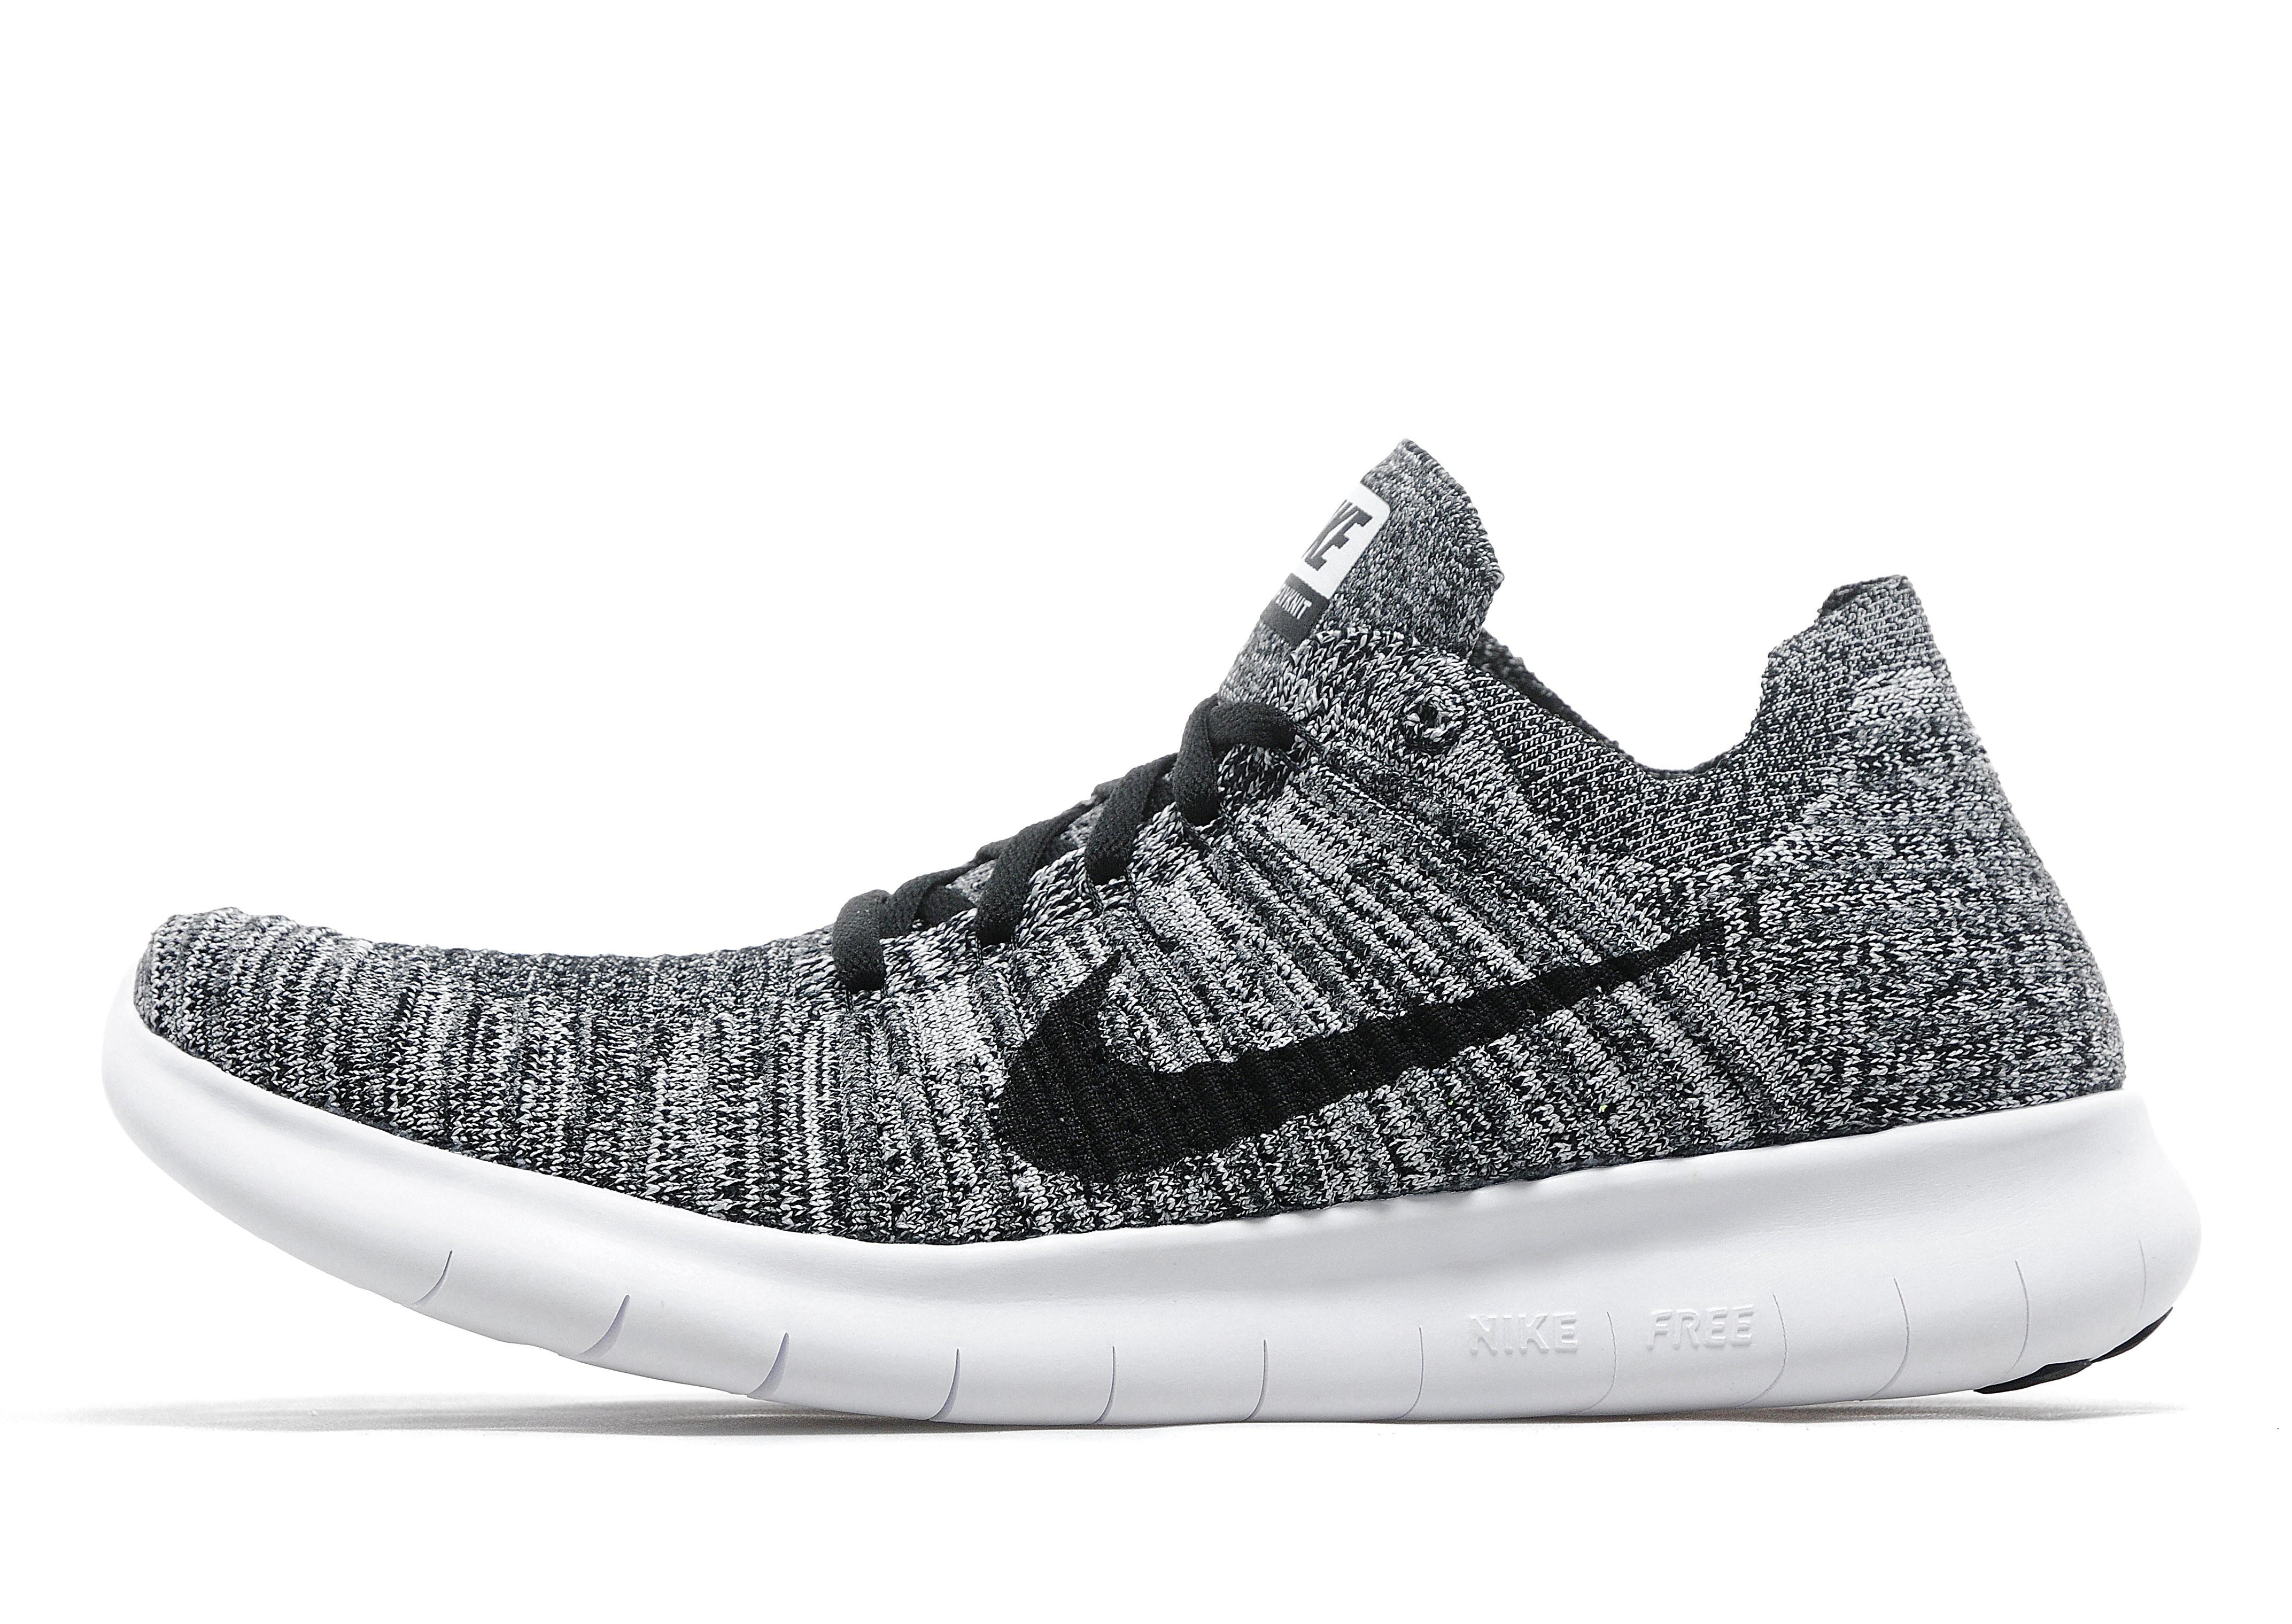 Nike Free Run Flyknit